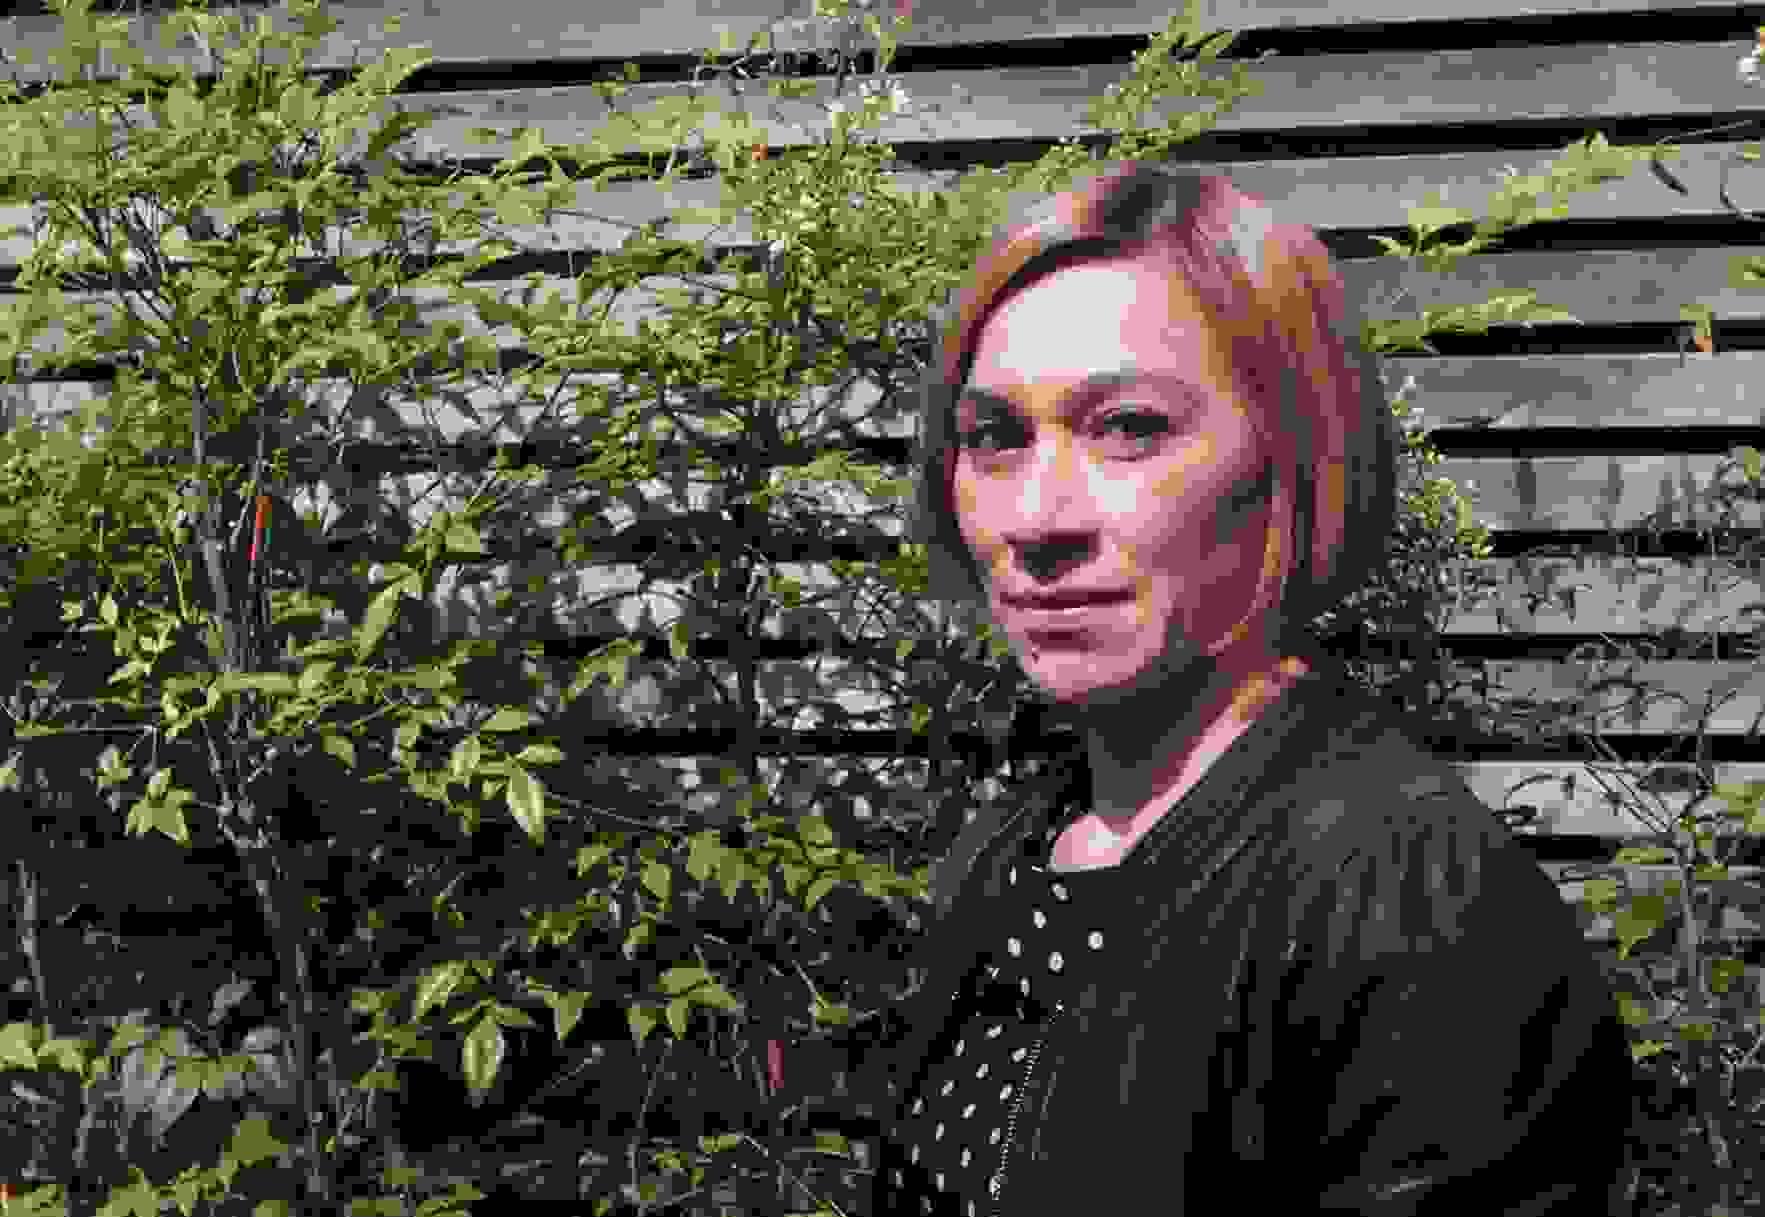 Melanie Cheng: On Reading and Empathy